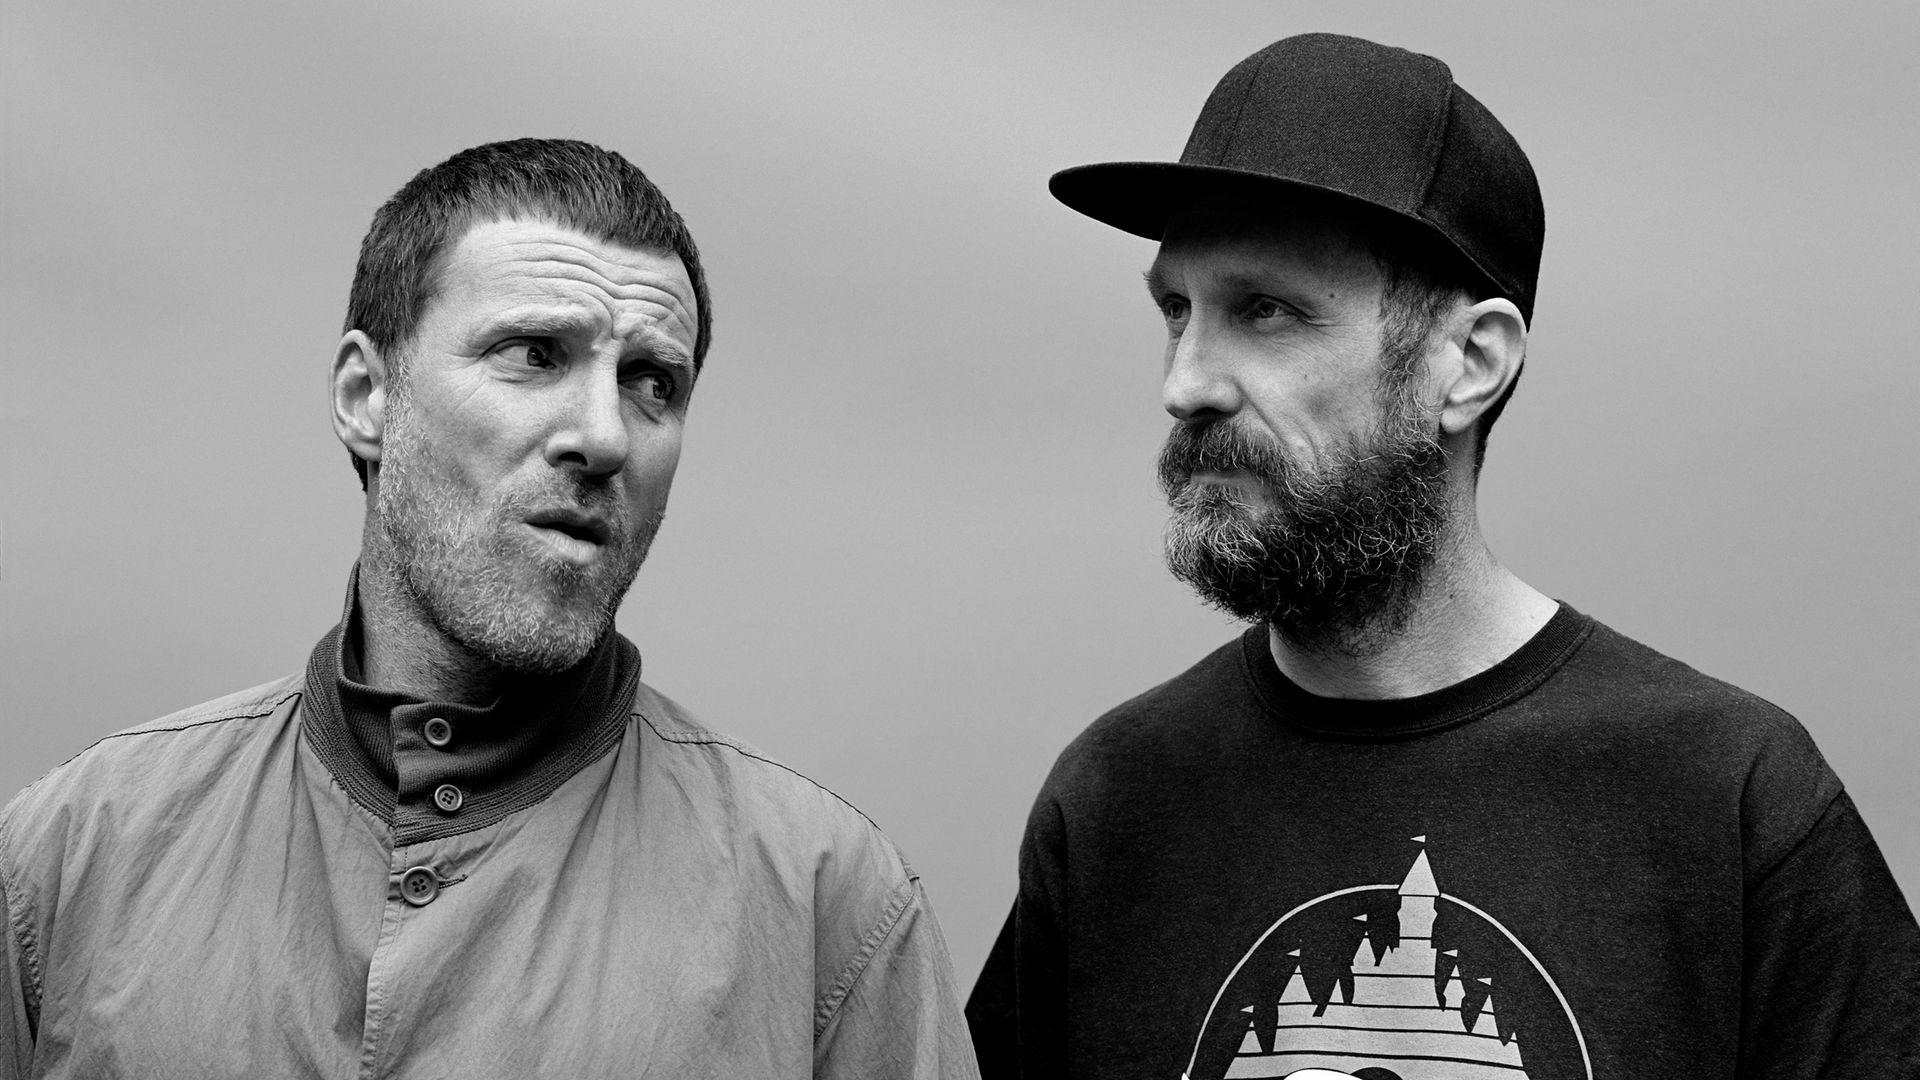 Jason Williamson (l) with Sleaford Mods bandmate Andrew Fearn - Credit: Alasdair McLennan